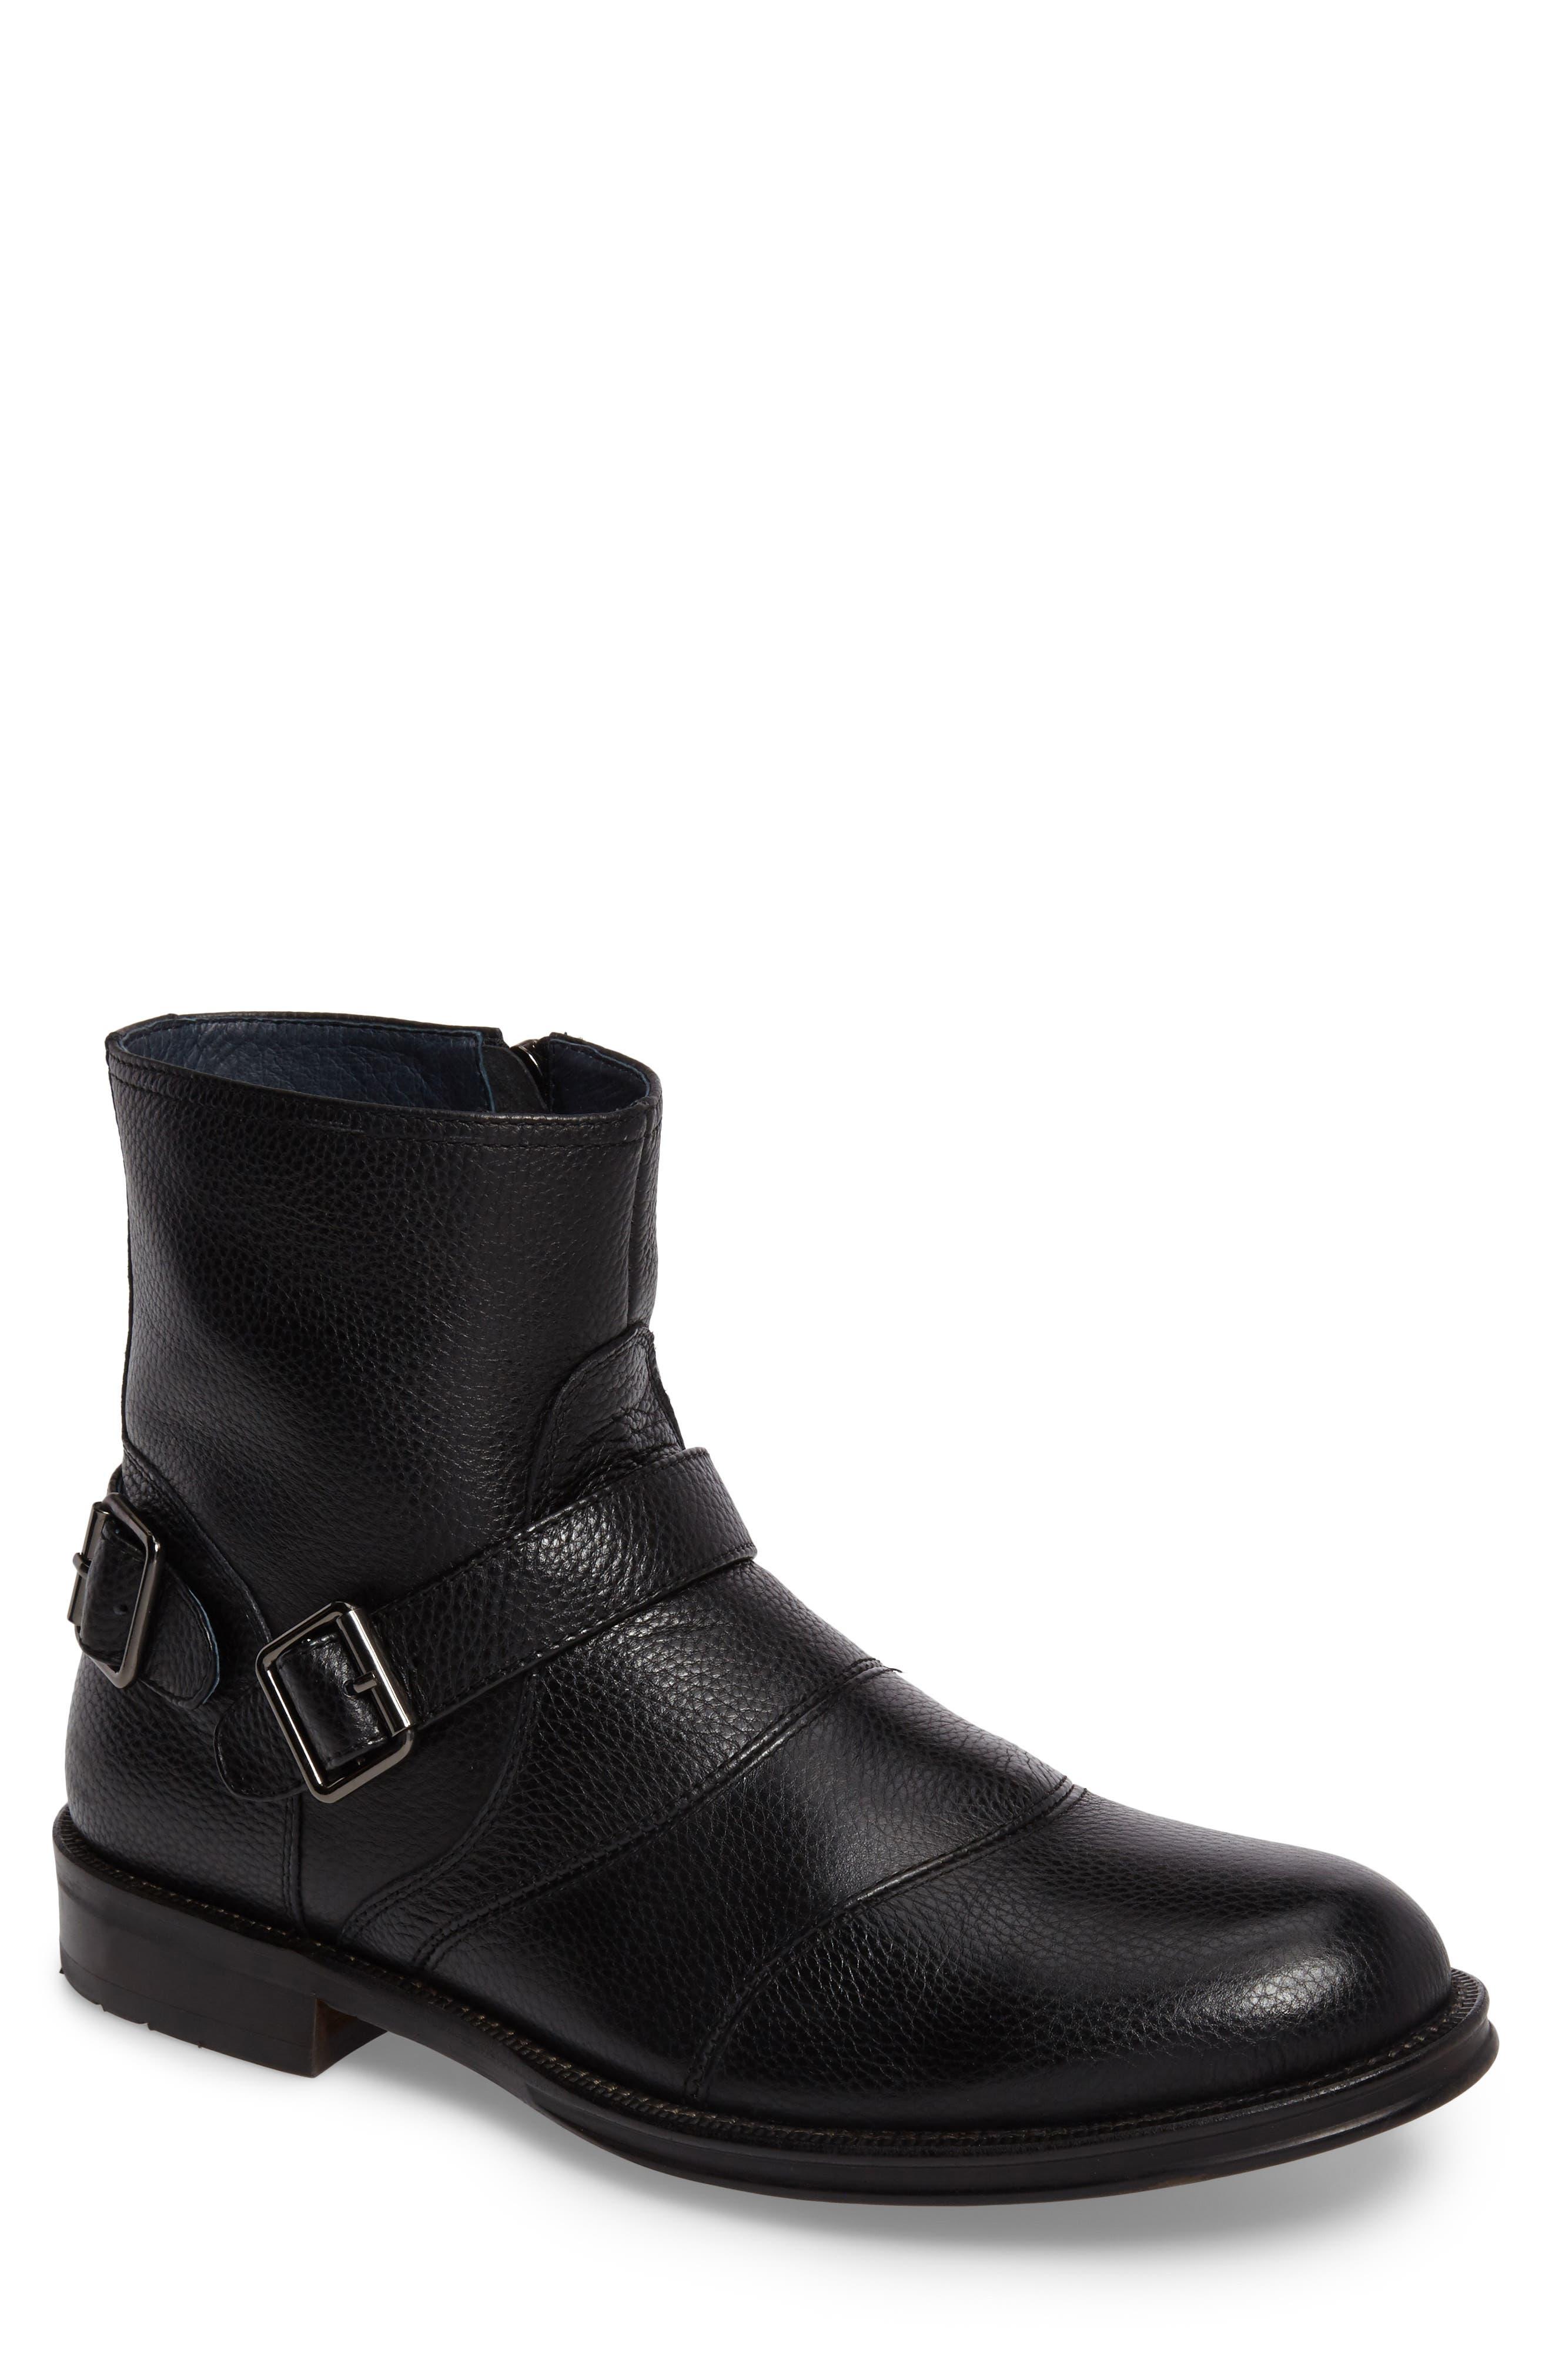 Zanzara Men's Howson Buckle Strap Boot